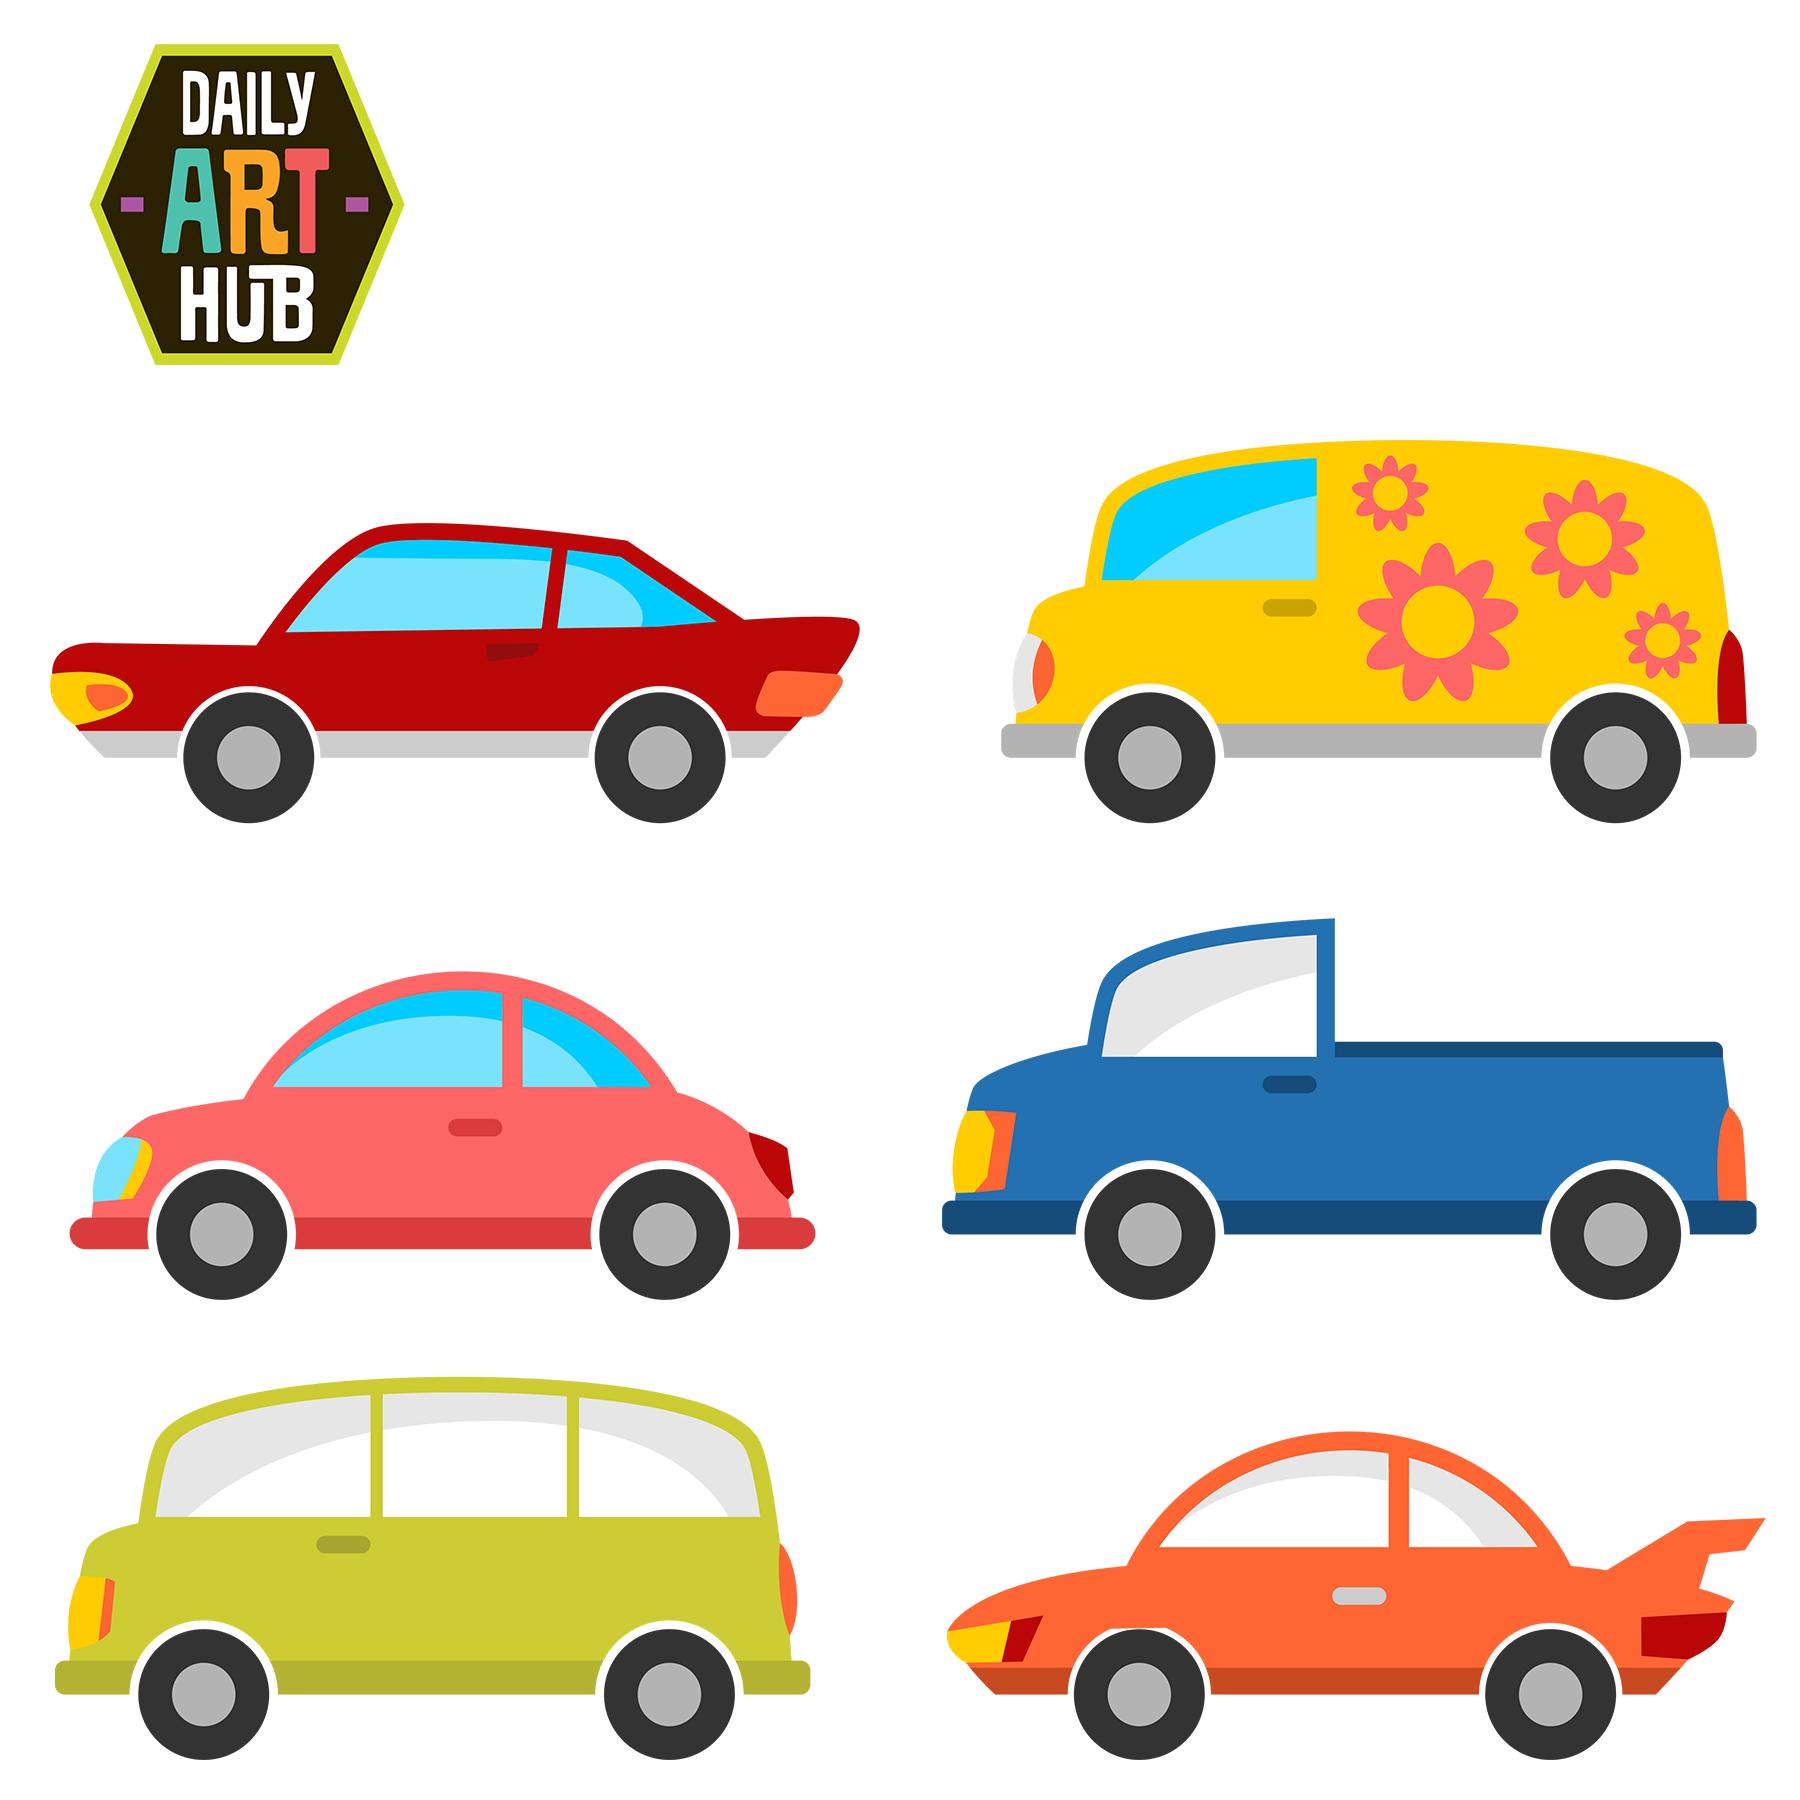 1800x1800 Cute Cars Clip Art Set Daily Art Hub Free Clip Art Everyday